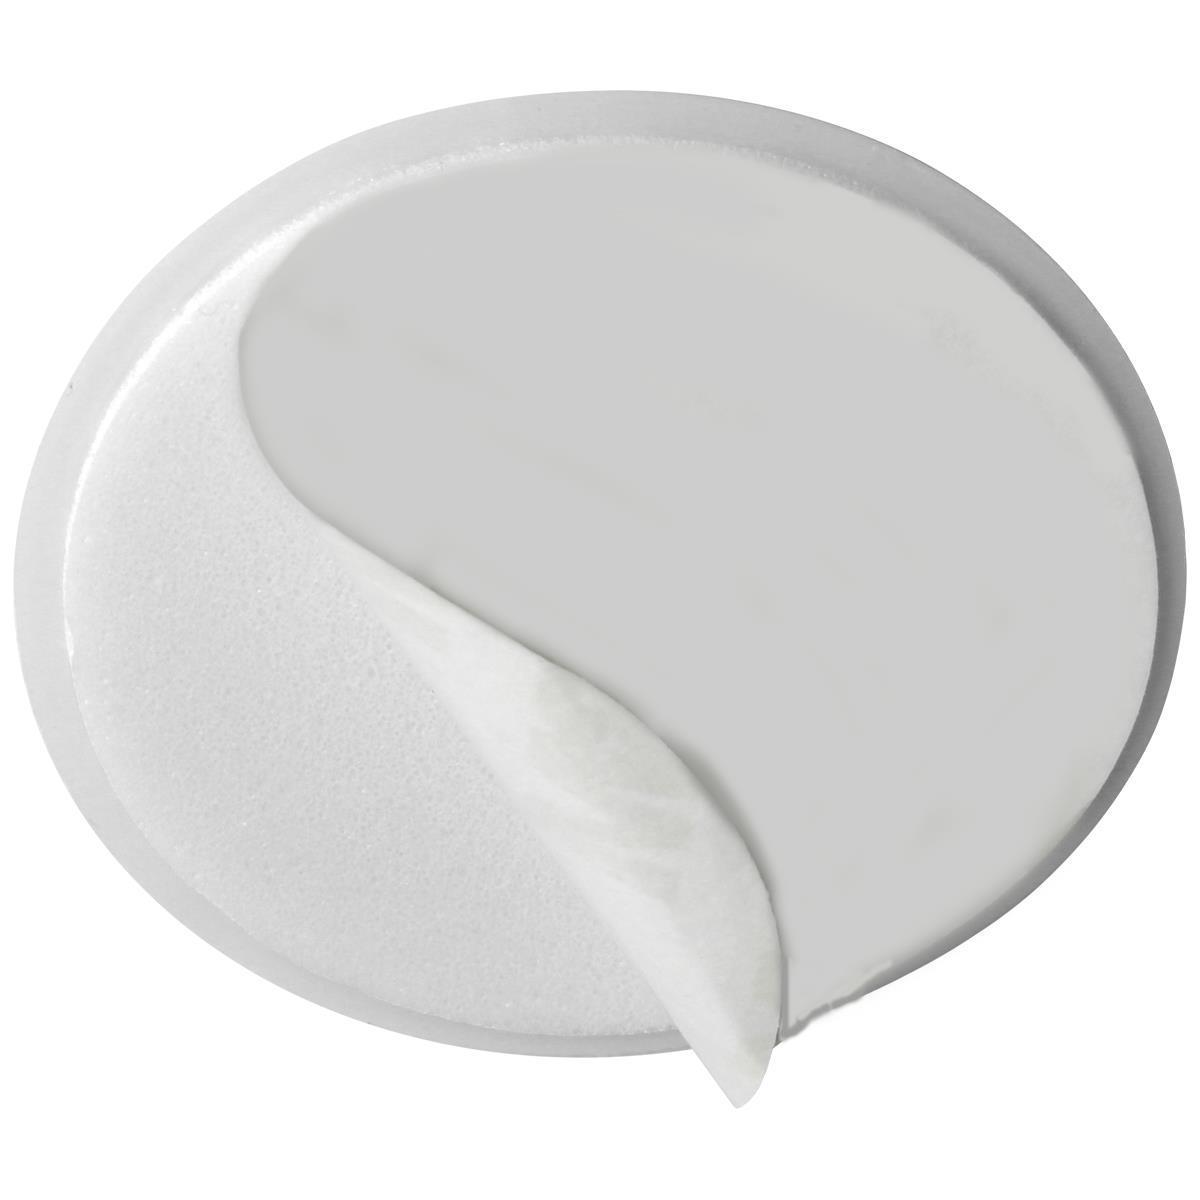 5-x-Wall-Protector-Self-Adhesive-Rubber-Stop-Door-Handle-Bumper-Guard-Stopper miniatuur 10